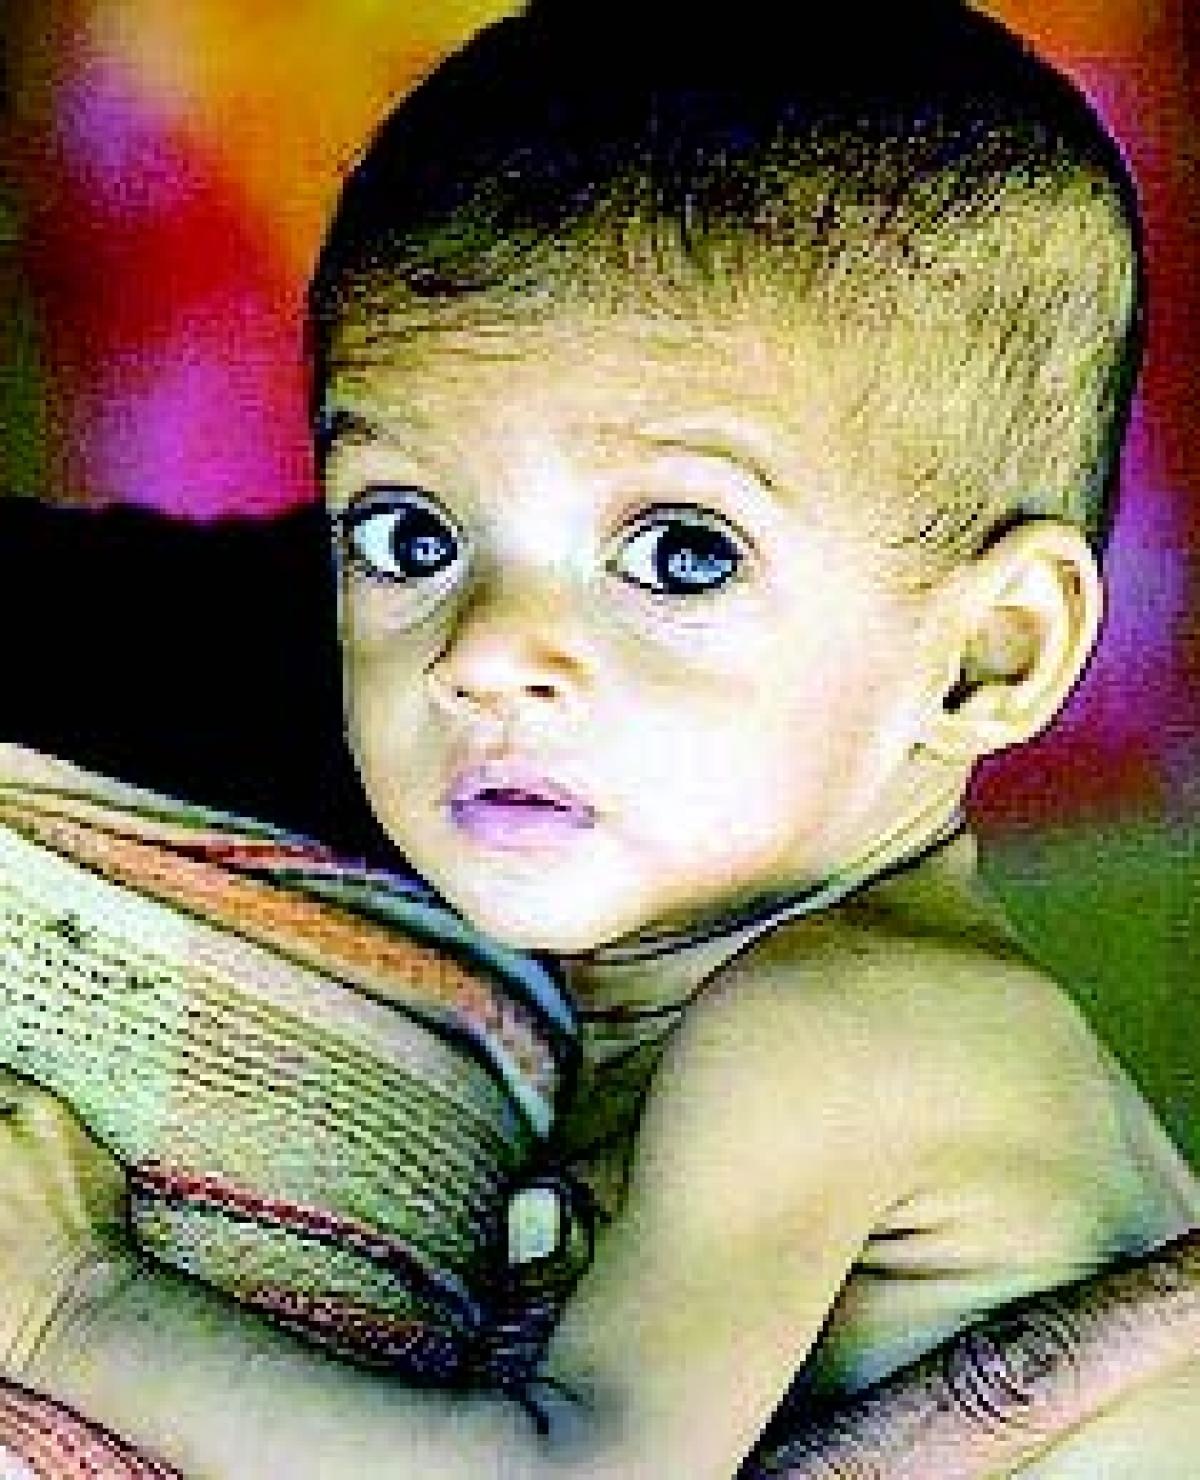 Malnutrition kills six more, after CS' visit